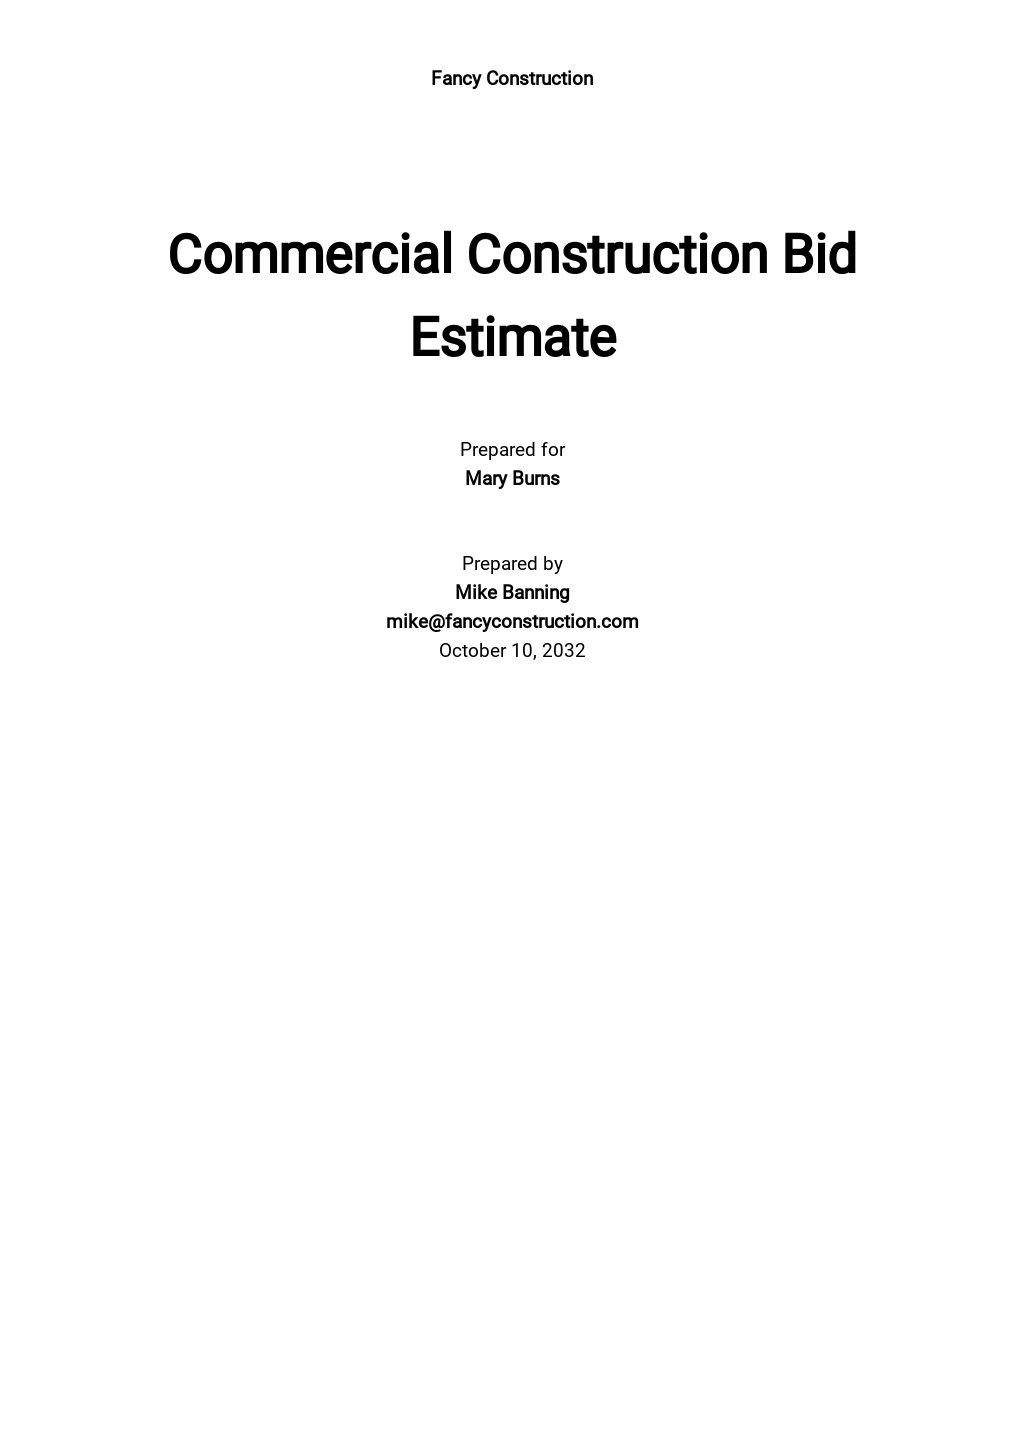 Commercial Construction Bid Estimate Template